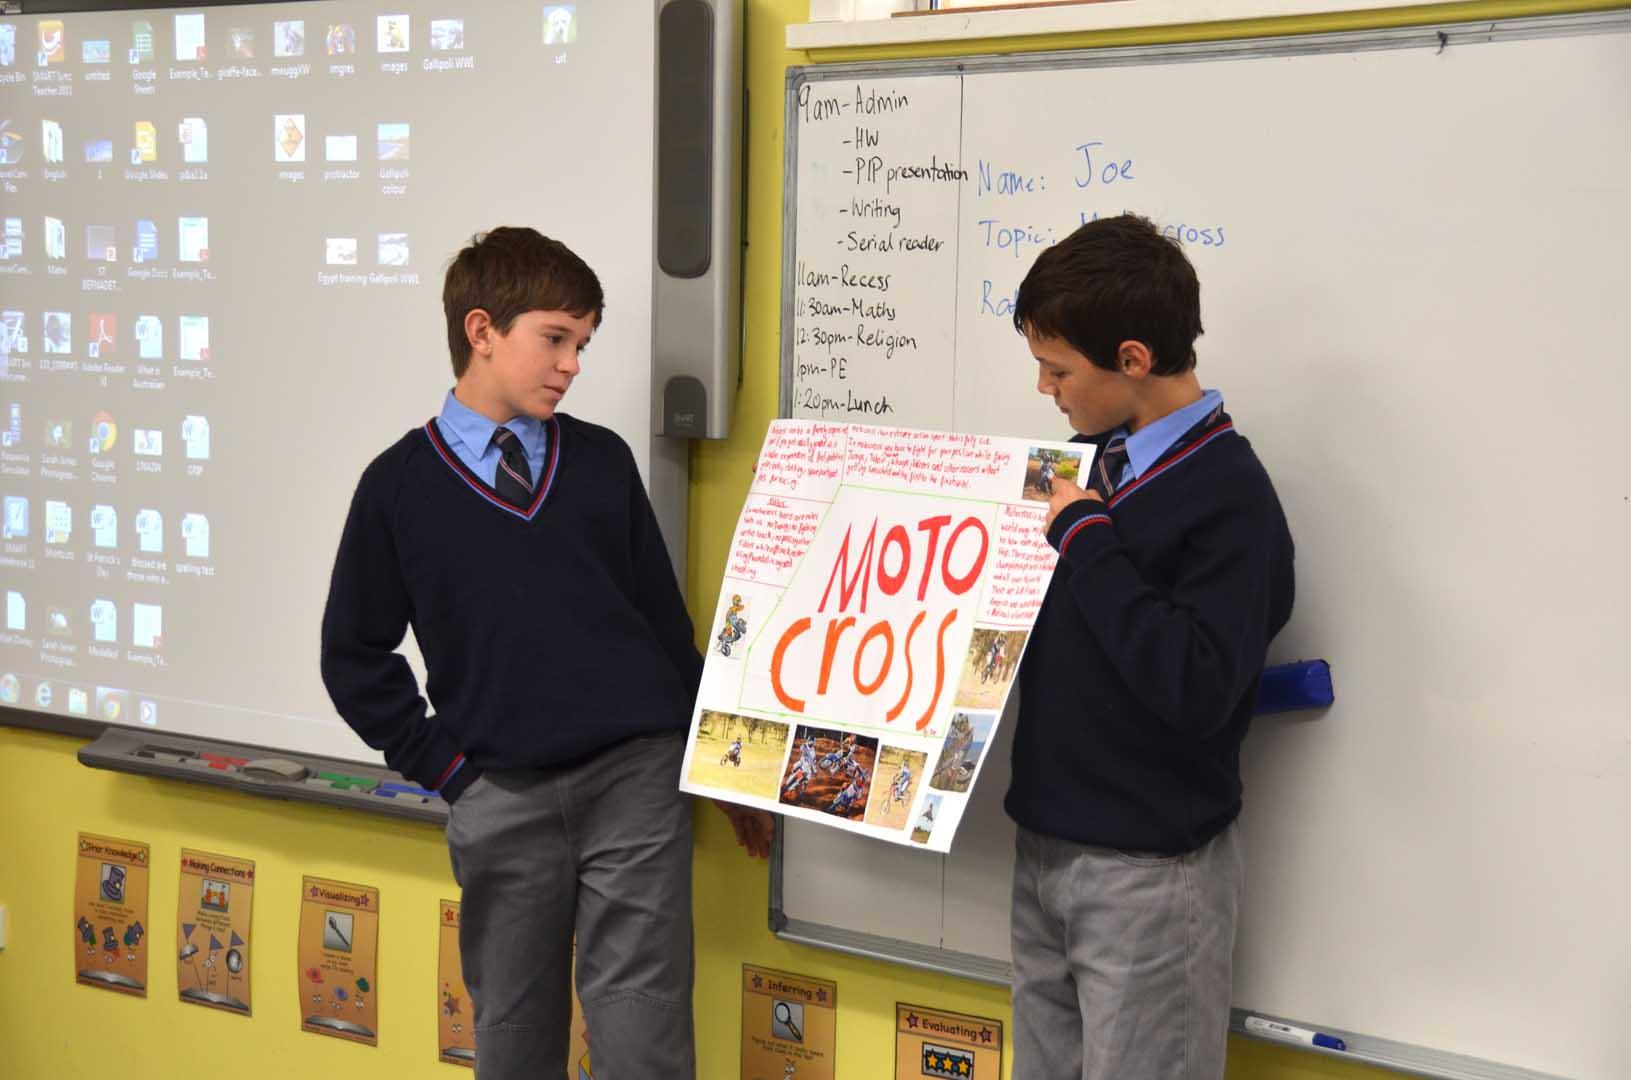 St-Patricks-walcha-classroom336